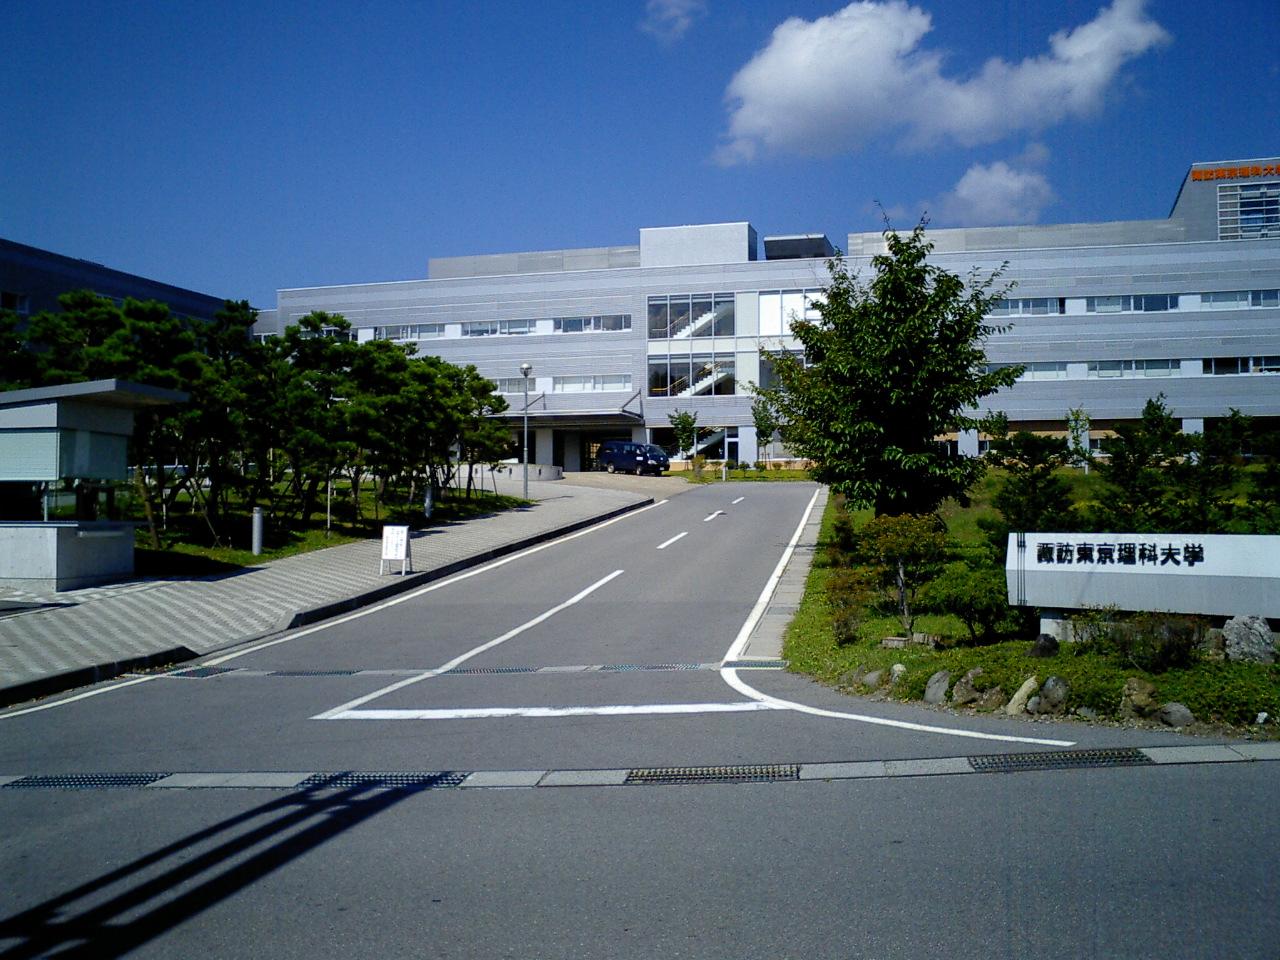 東京 理科 大 東京理科大学/大学トップ|大学受験パスナビ:旺文社